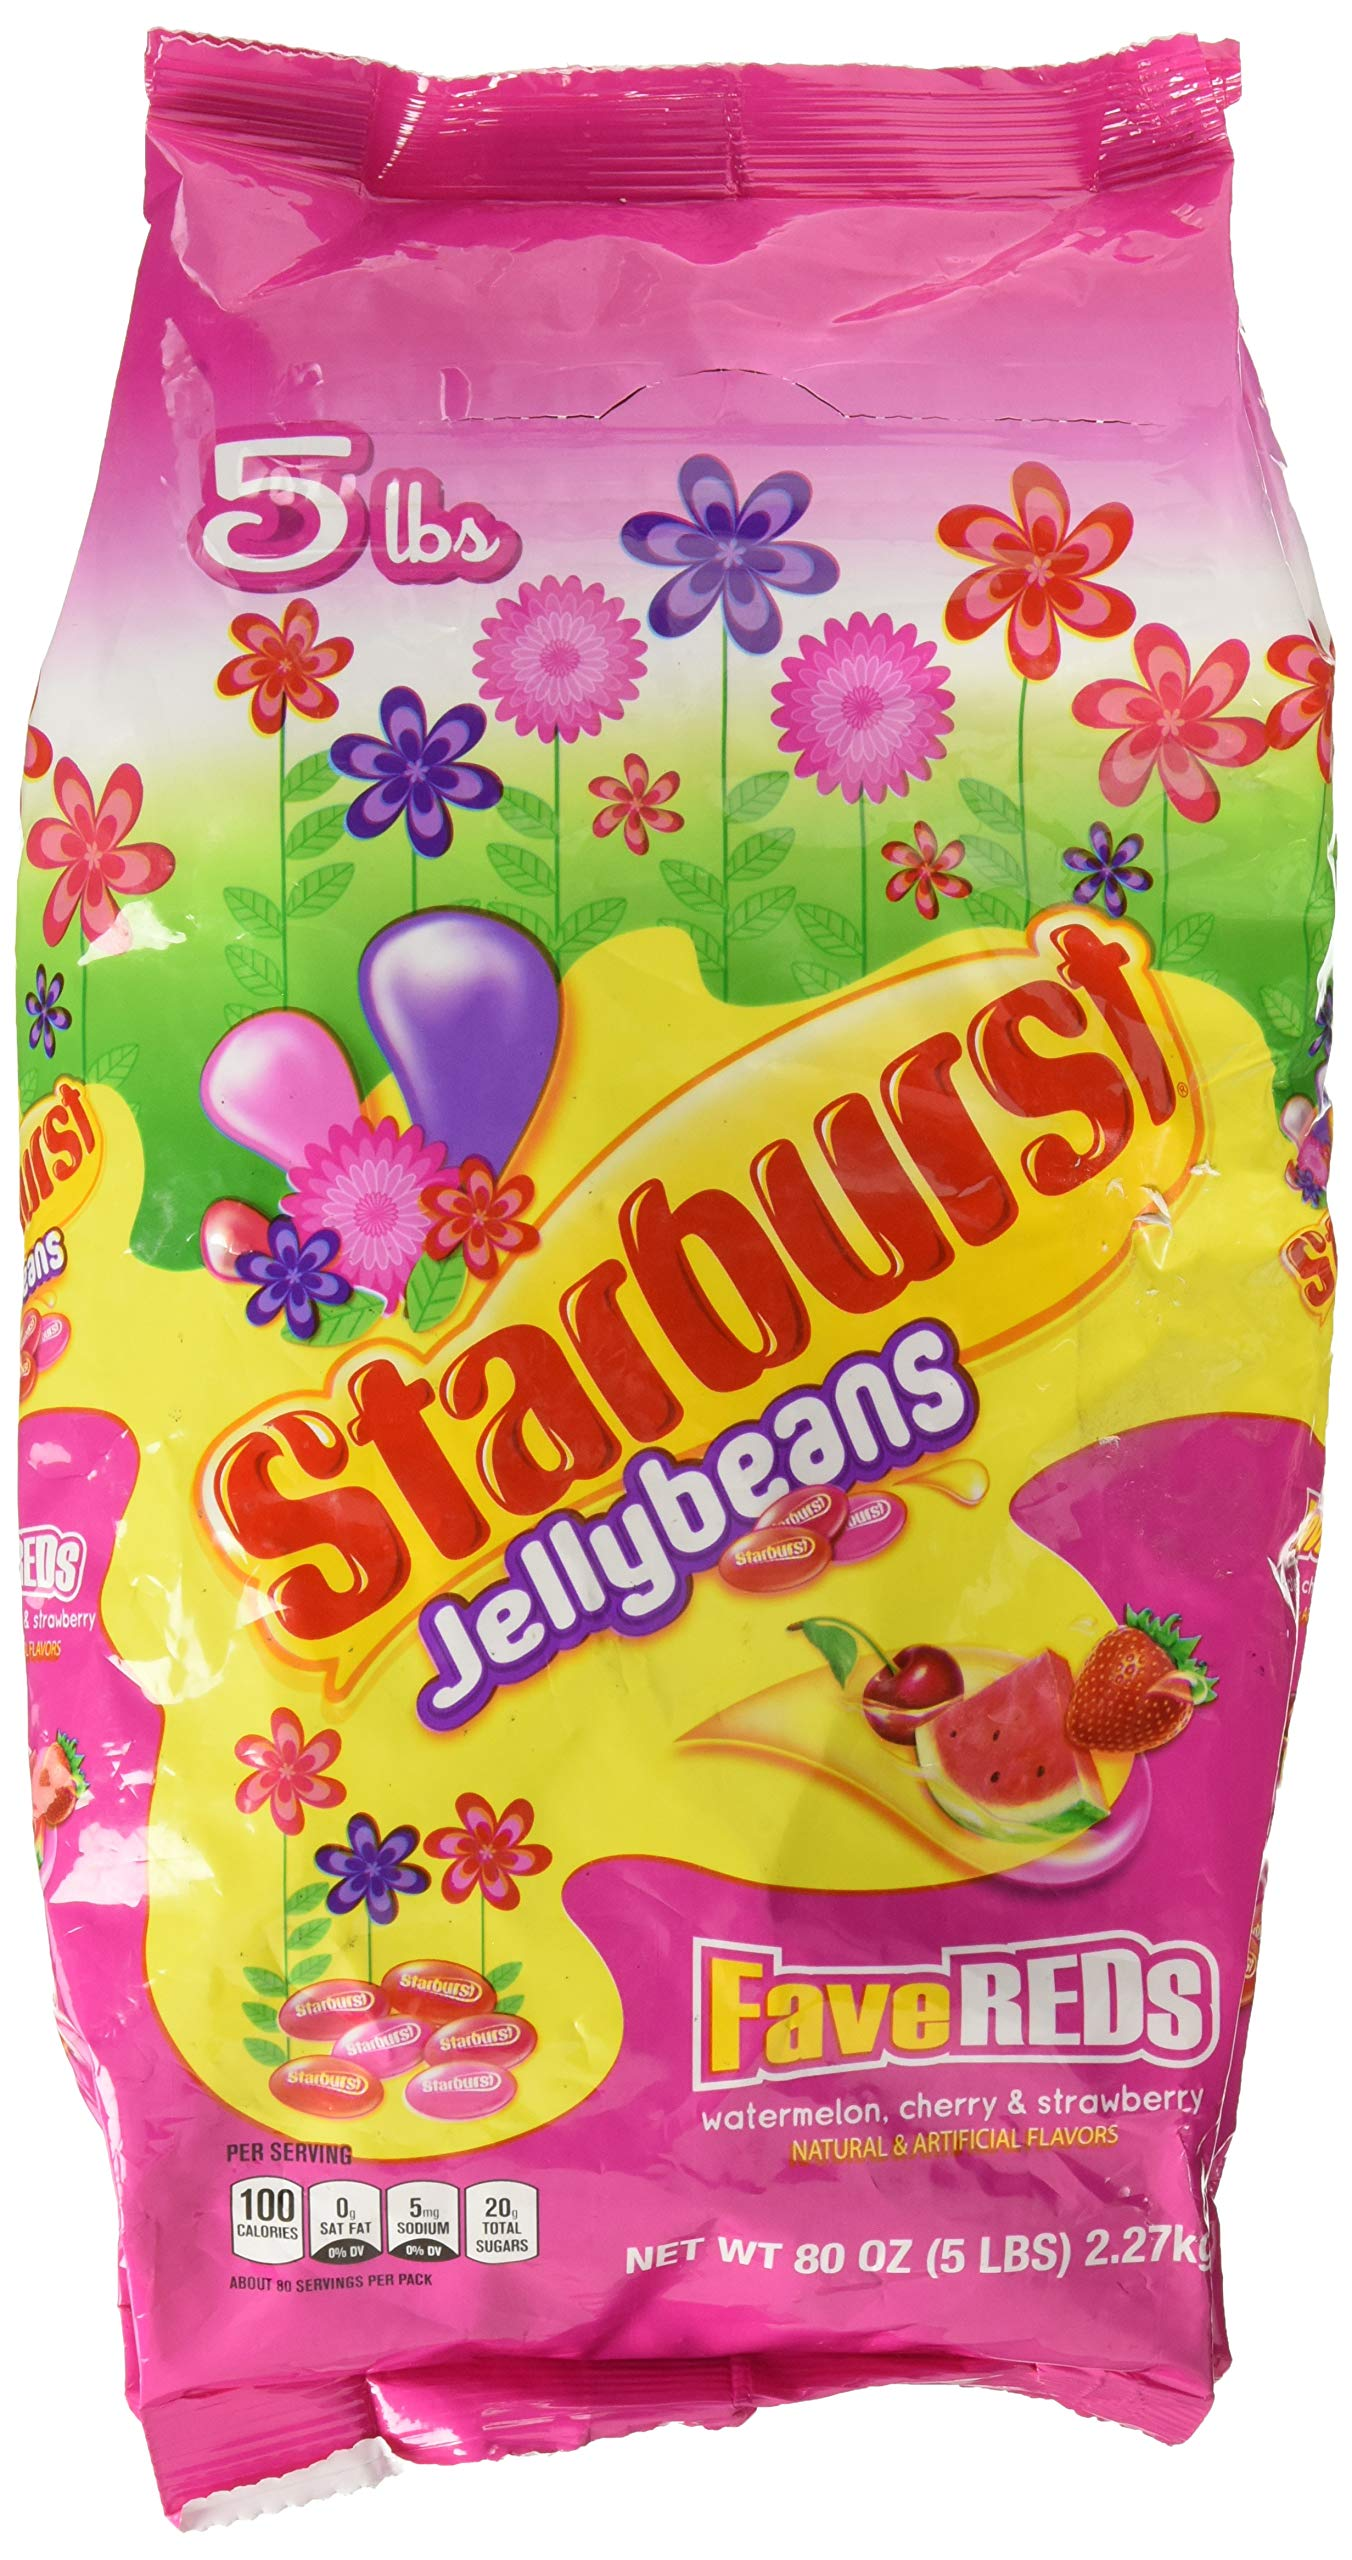 Starburst Jelly Beans FaveREDs Flavors, 80 oz, 5 lb